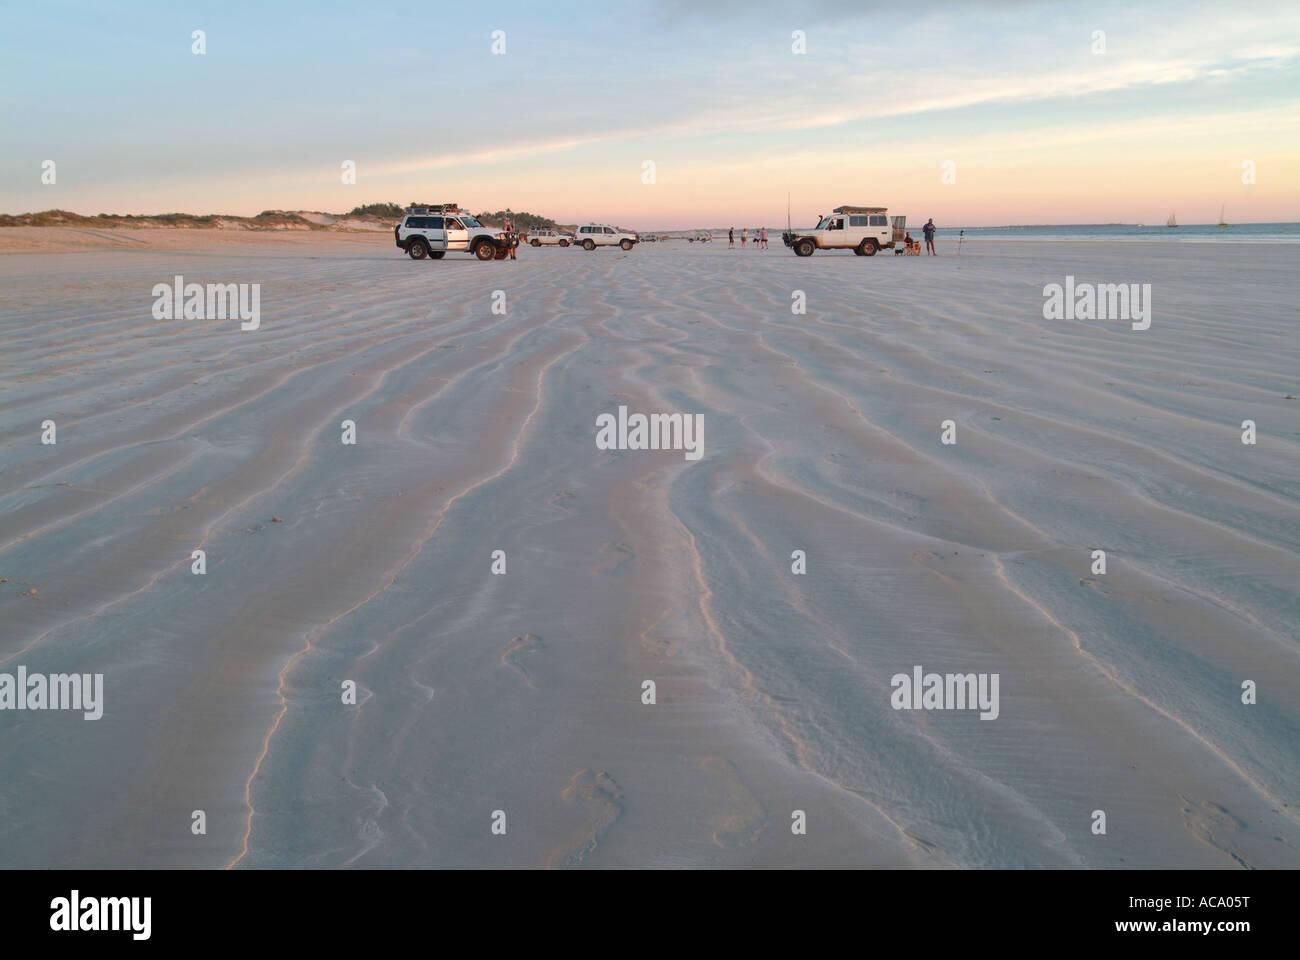 Veicolo fuoristrada, Cable Beach, Broome, Kimberleys, Australia occidentale Immagini Stock